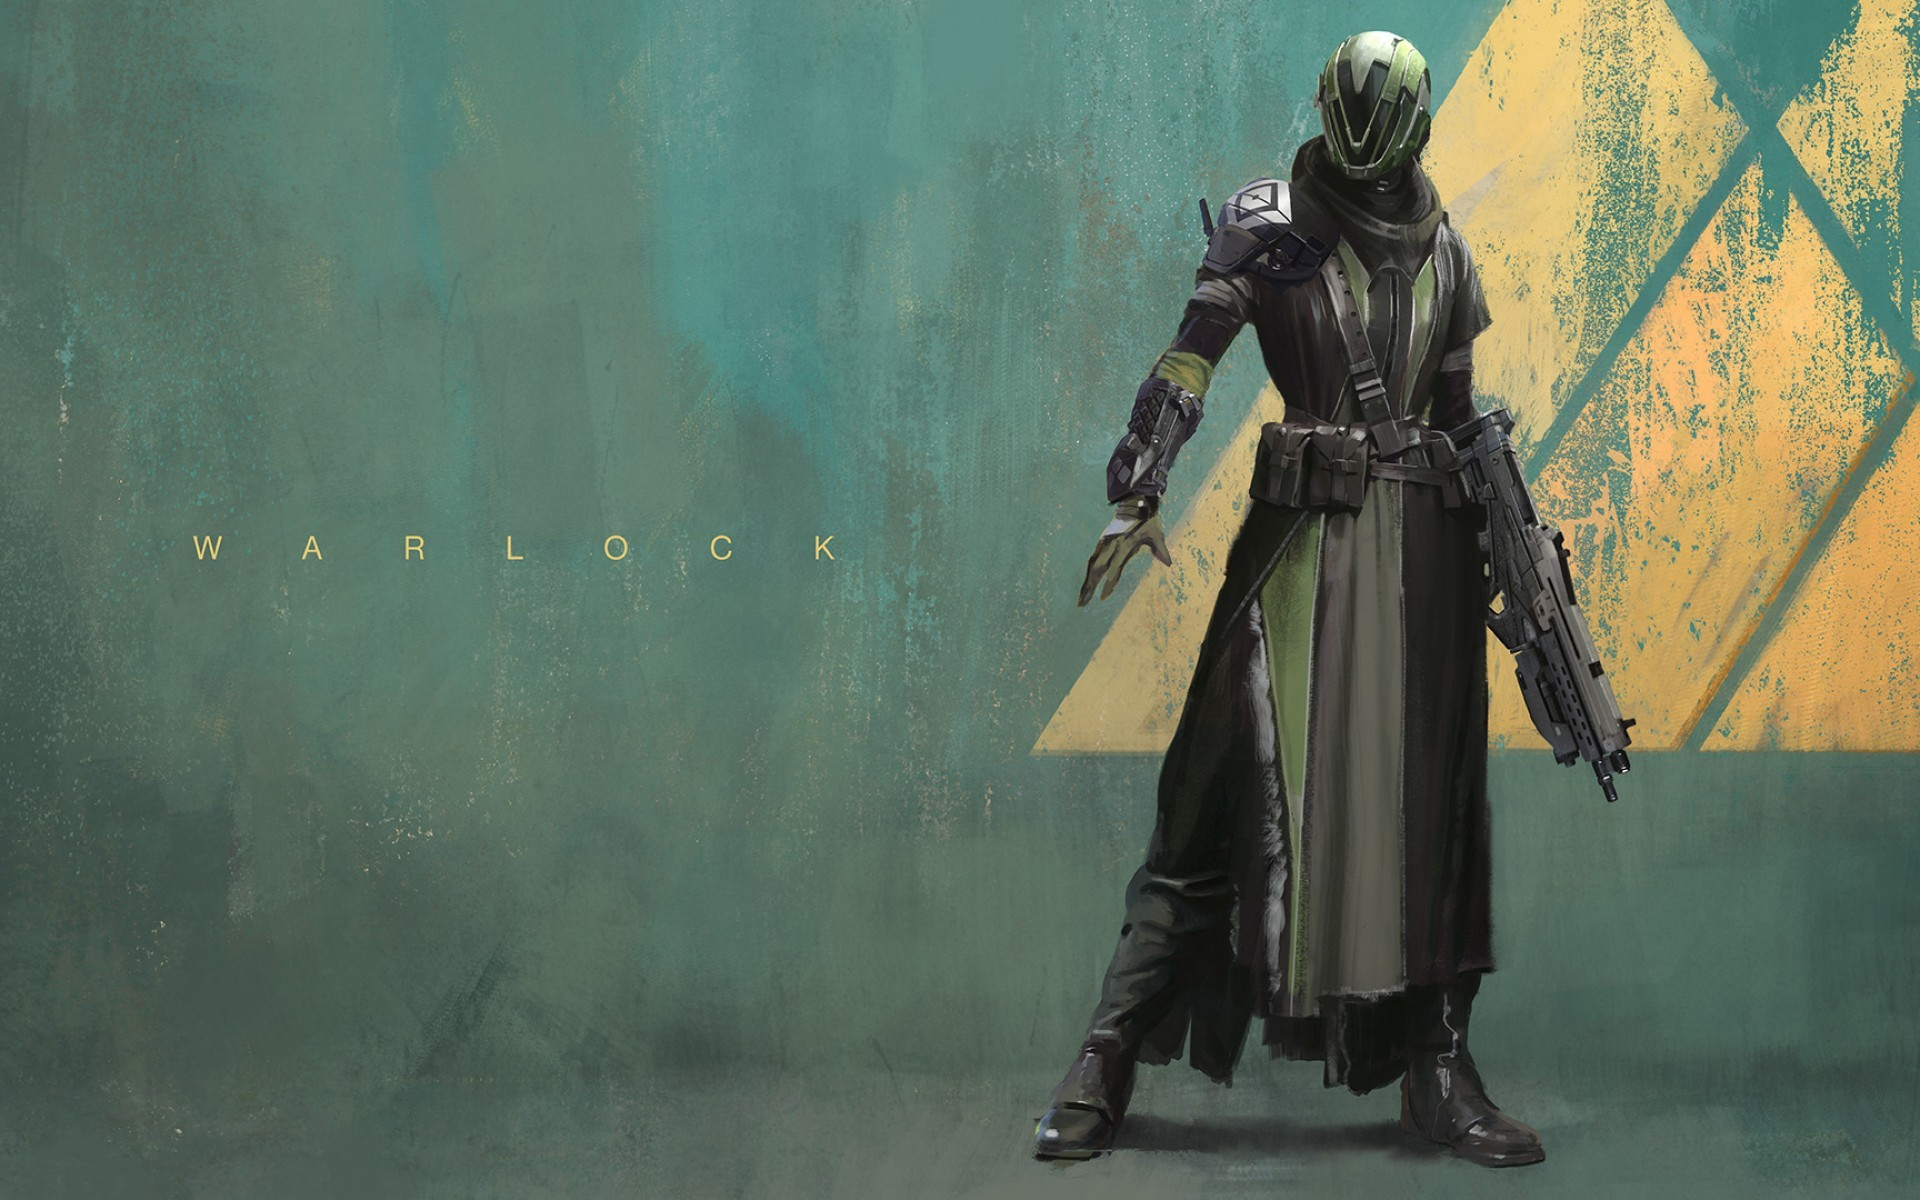 Destiny Warlock Wallpaper 2986